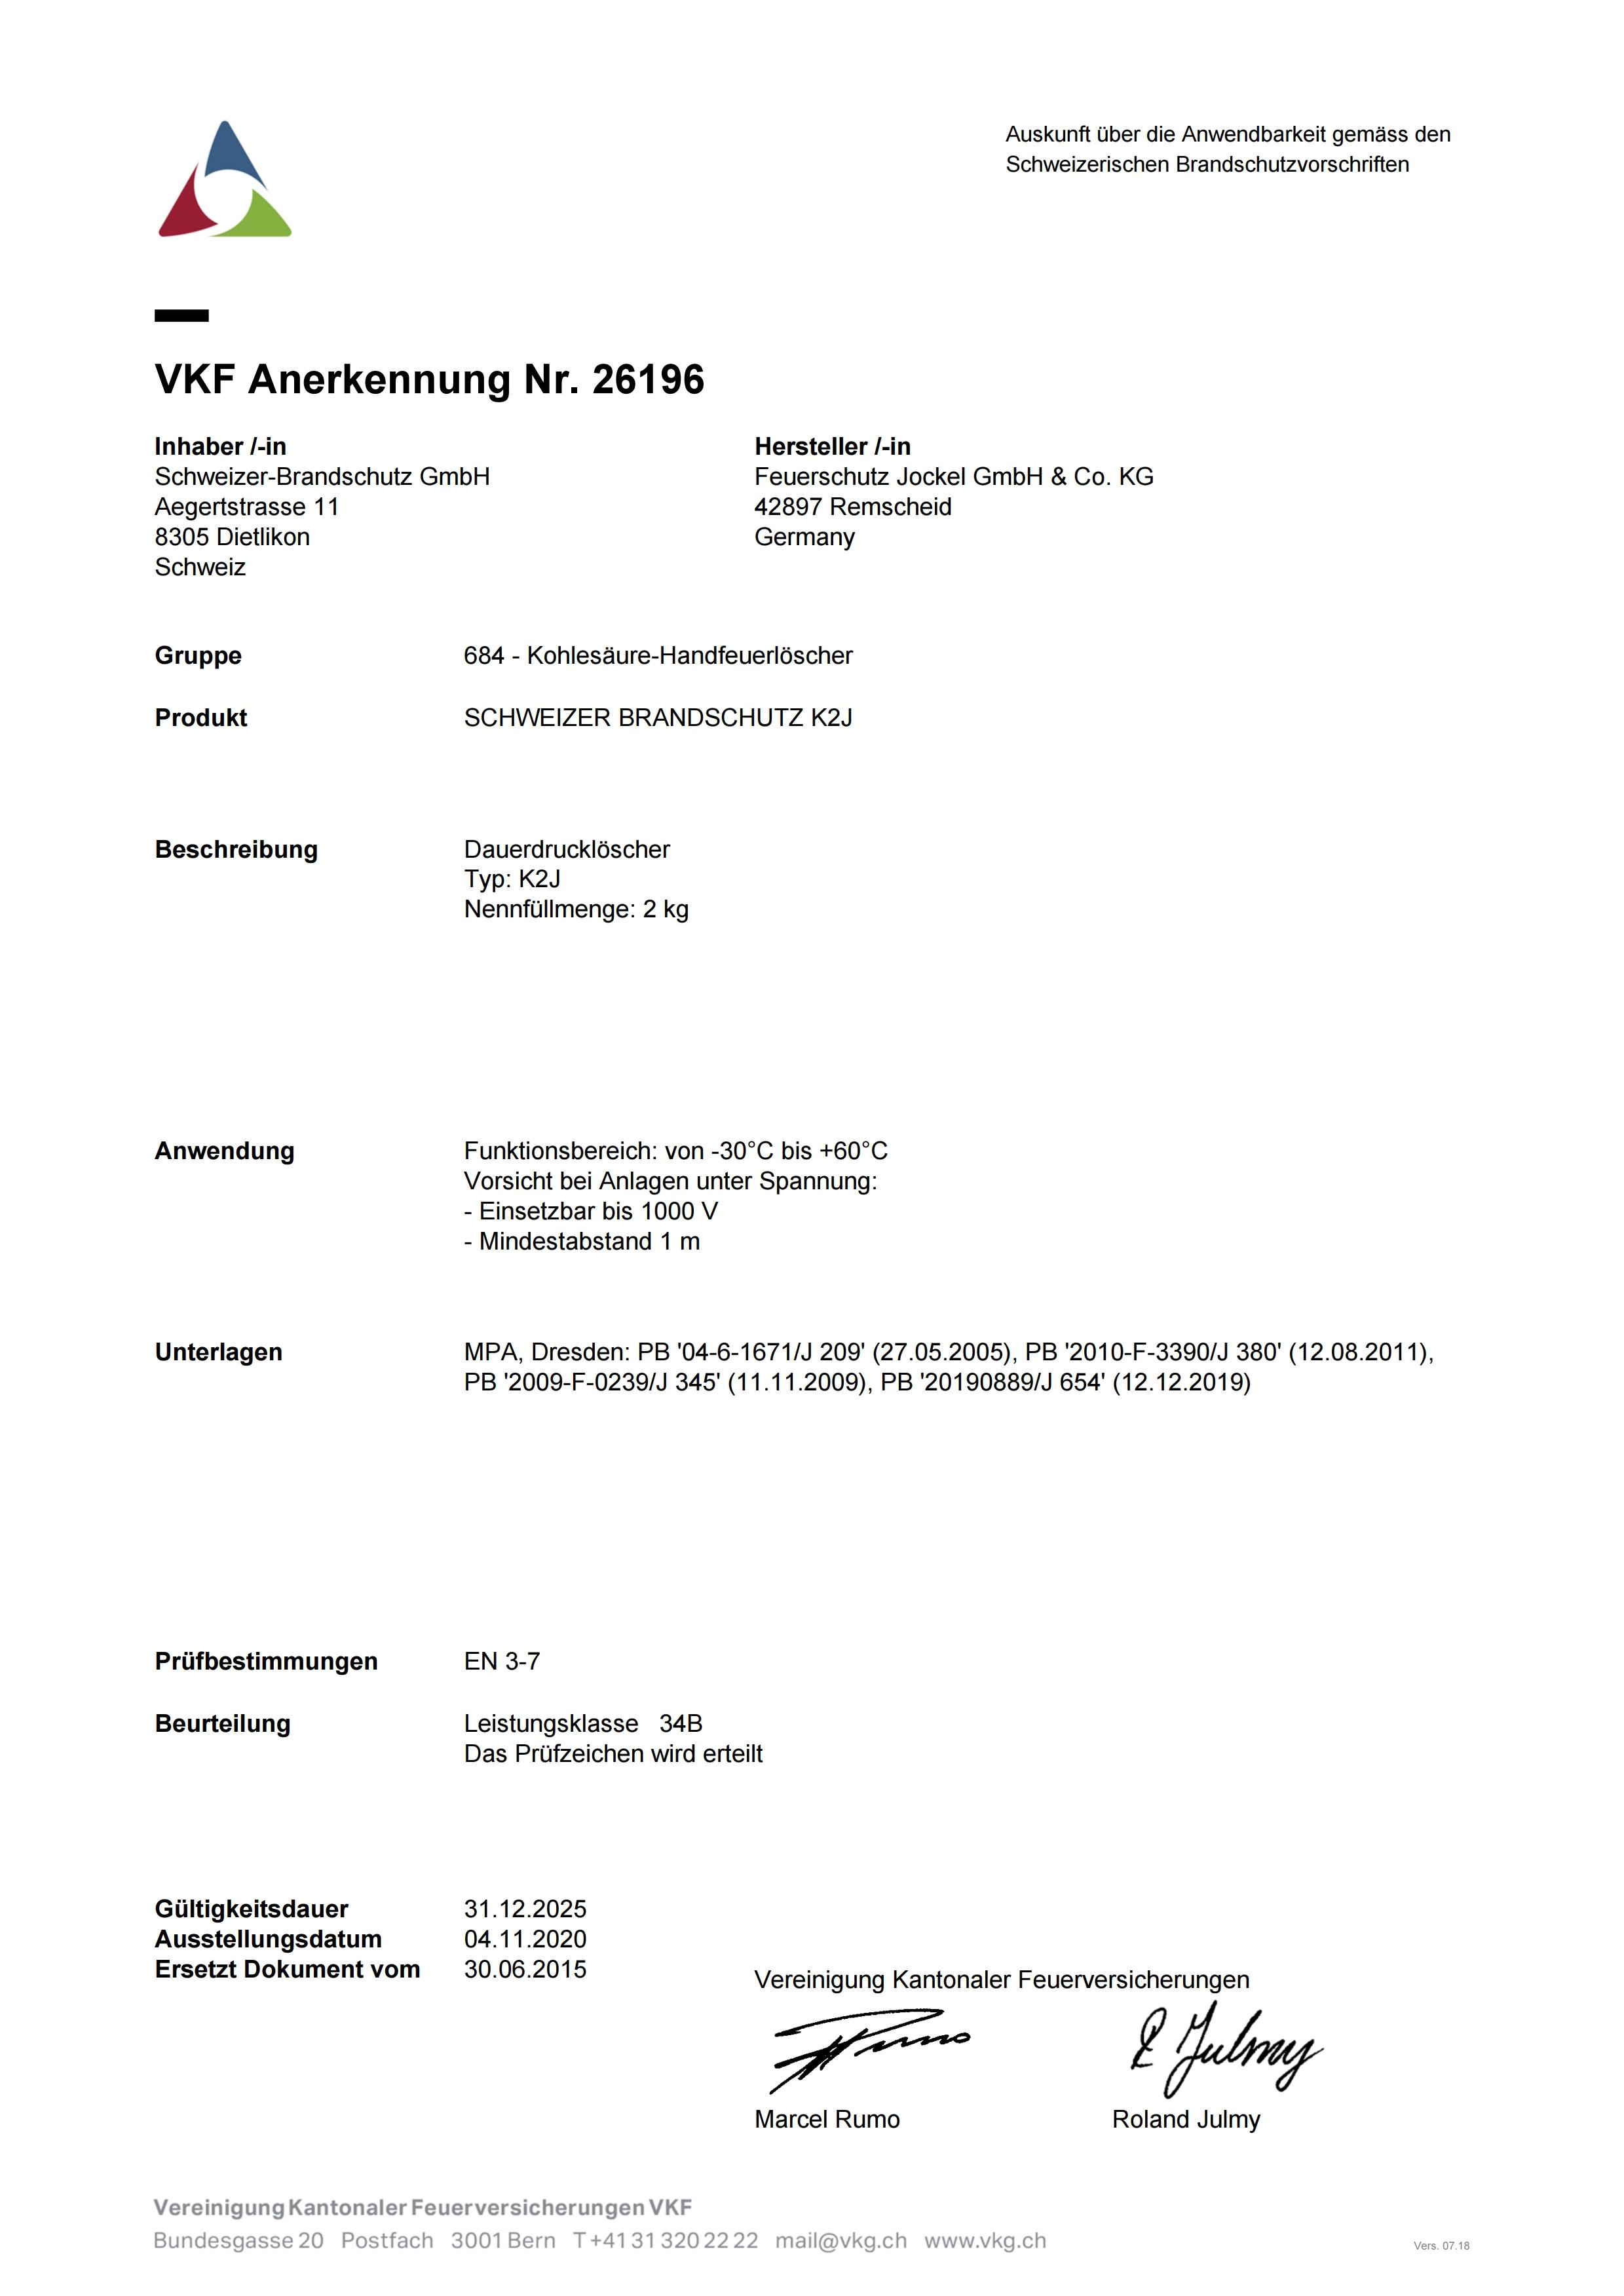 VKF Zulassung Co2 Feuerlöscher 2 Kilo